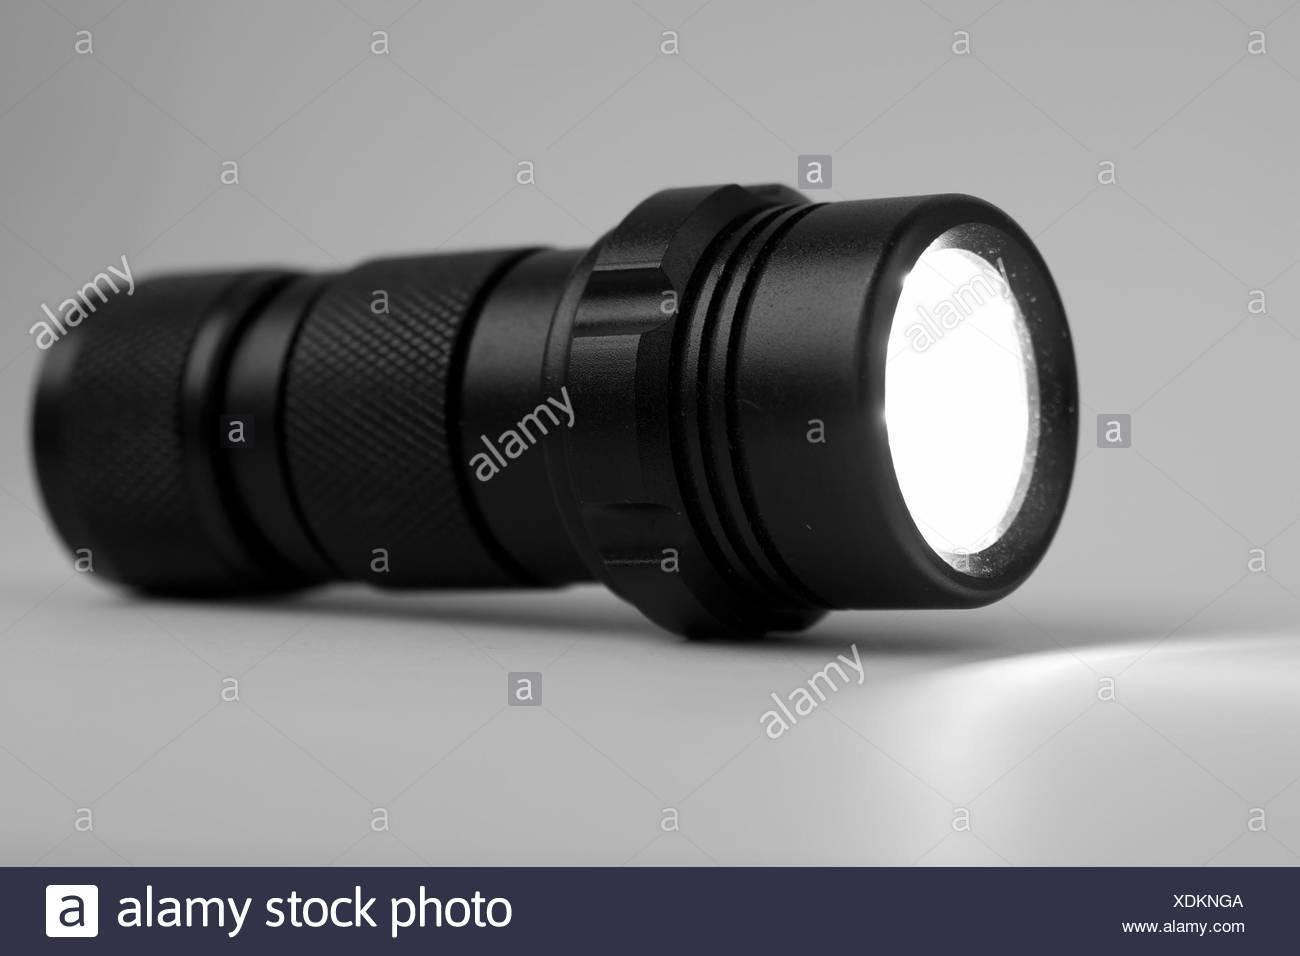 pocket lamp - Stock Image